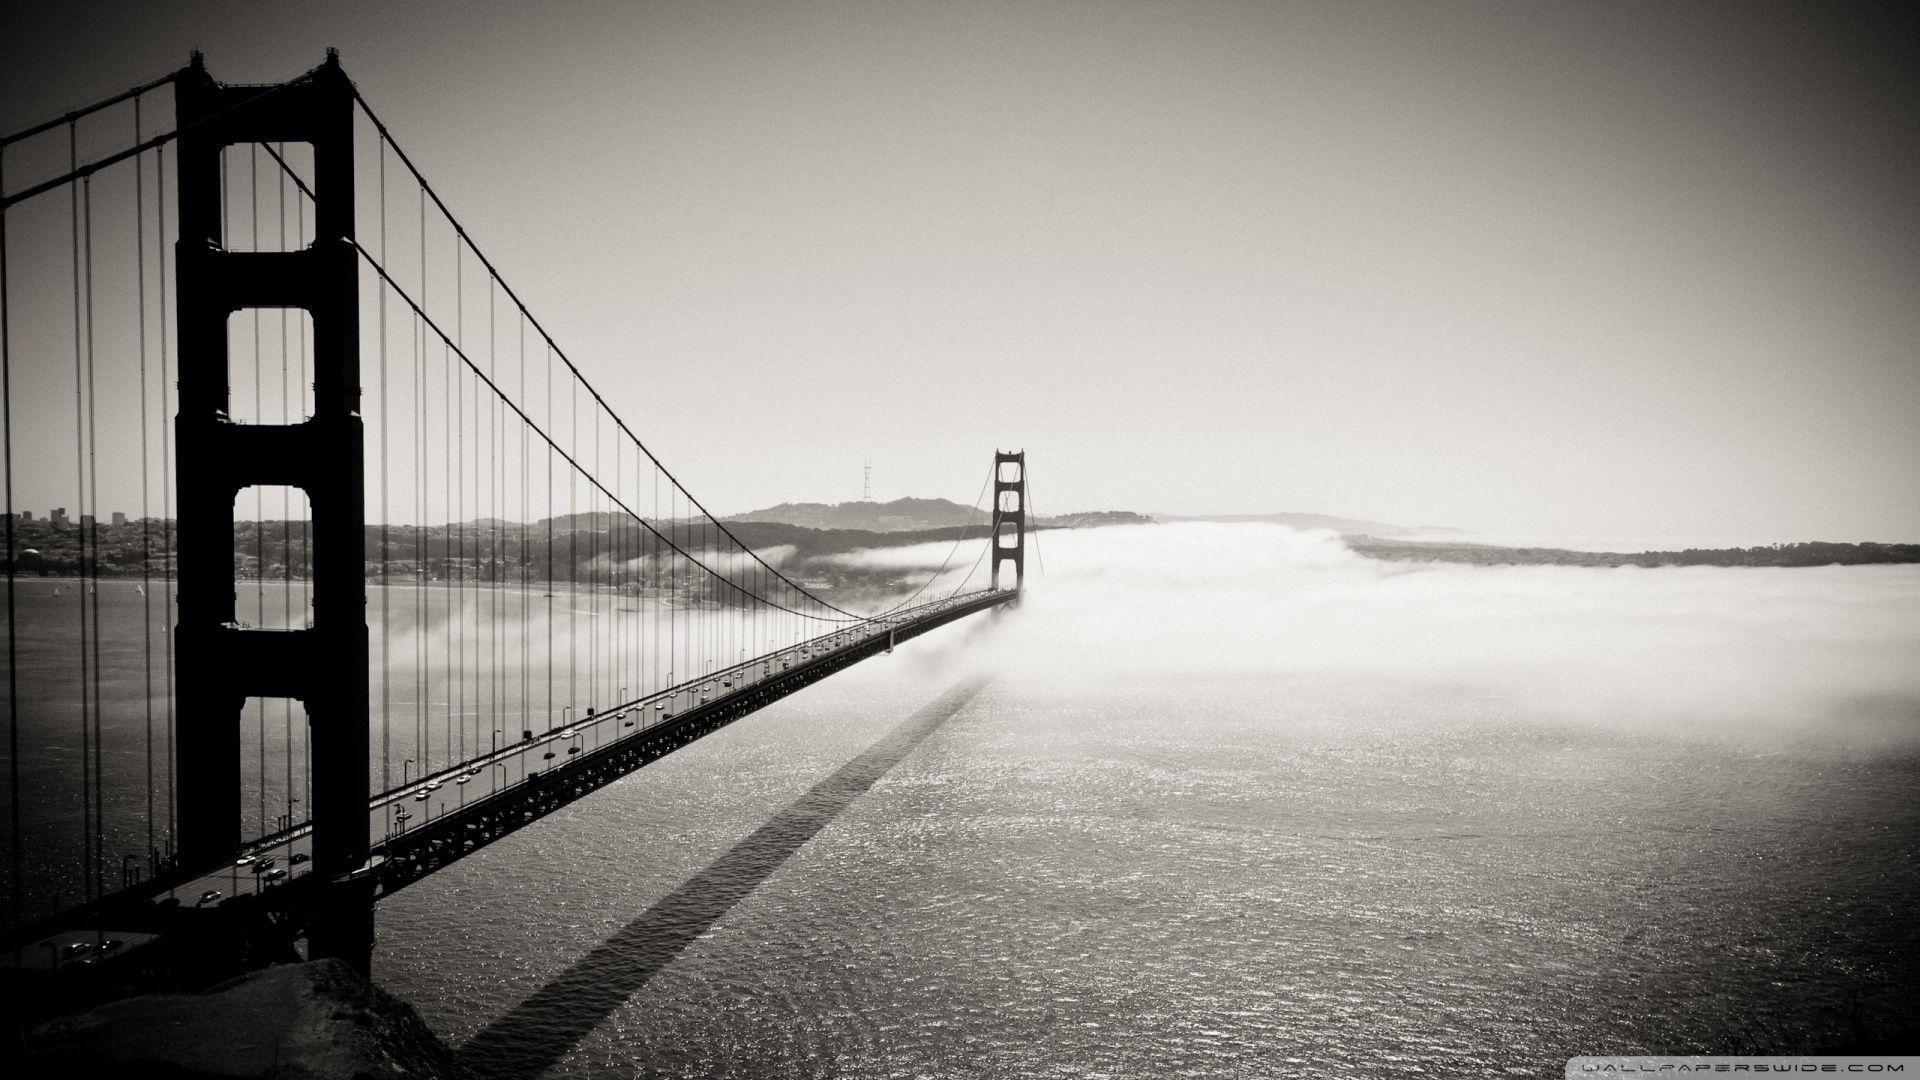 Golden Gate Bridge Black And White Wallpaper   Vintage